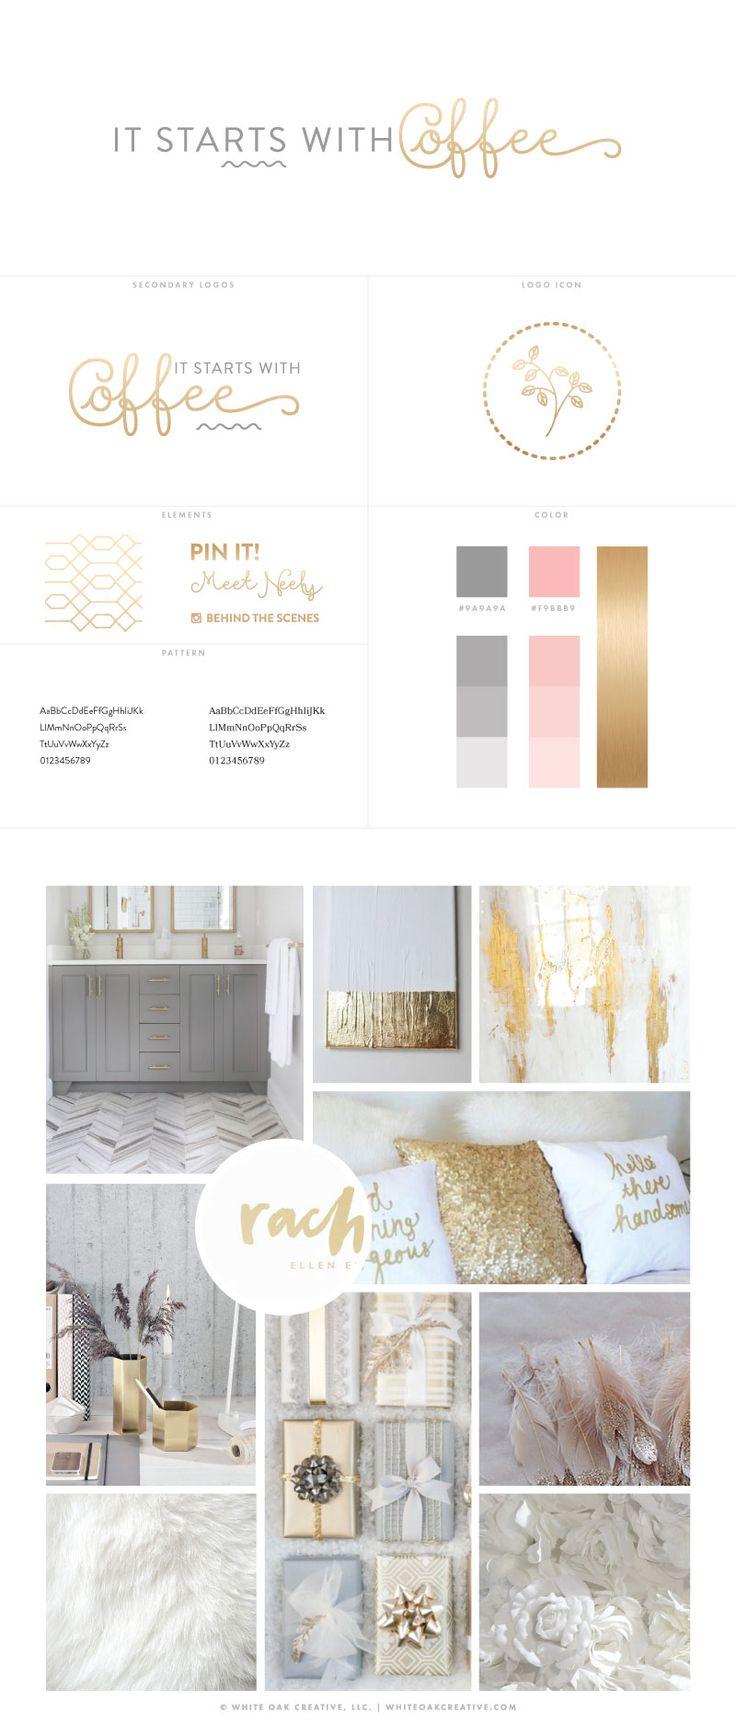 It Starts With Coffee Blog Redesign By White Oak Creative, Blog Design, Branding, Graphic Design, WordPress Design, Feminine Blog Design